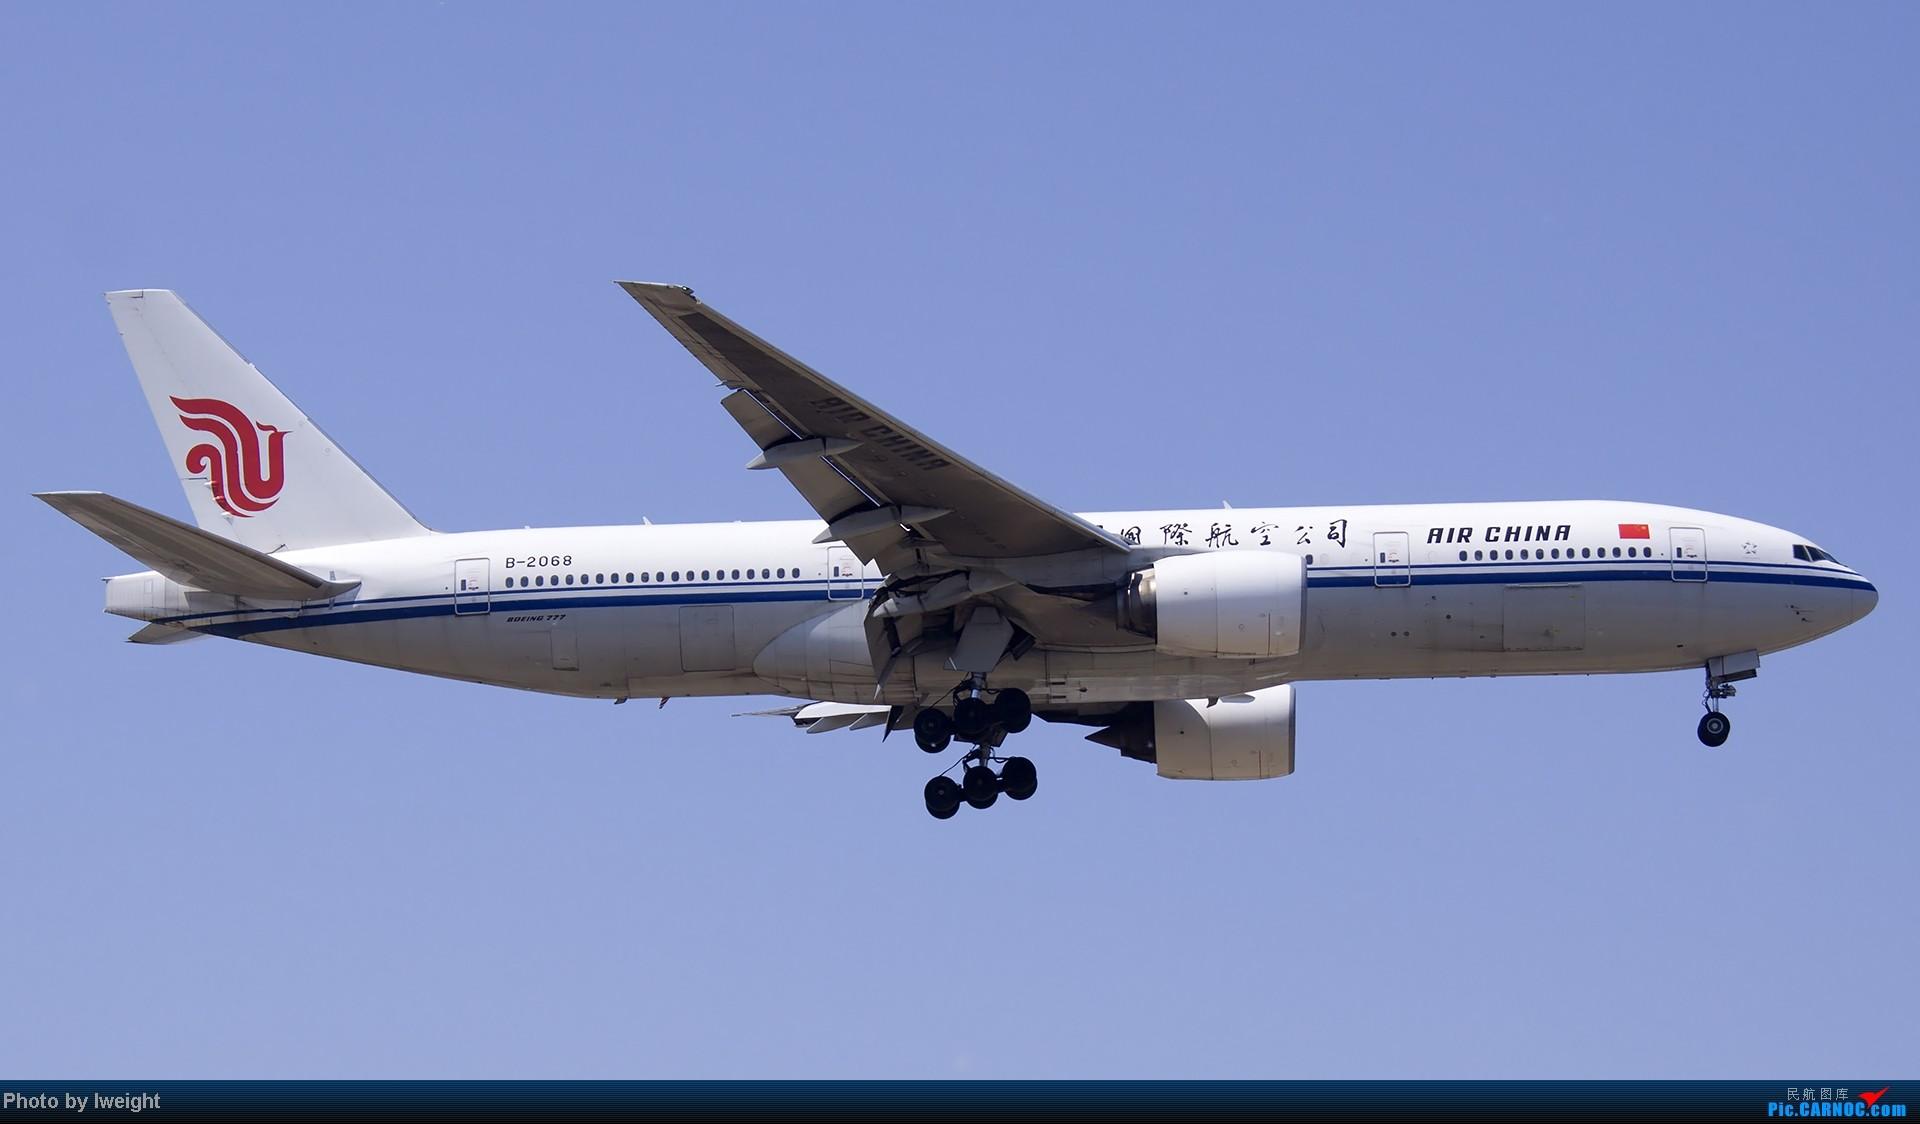 Re:[原创]北京难得的好天气,收获多种机型和彩绘,遗憾的是再次错过卡航巴塞罗那彩绘 BOEING 777-200 B-2068 中国北京首都机场